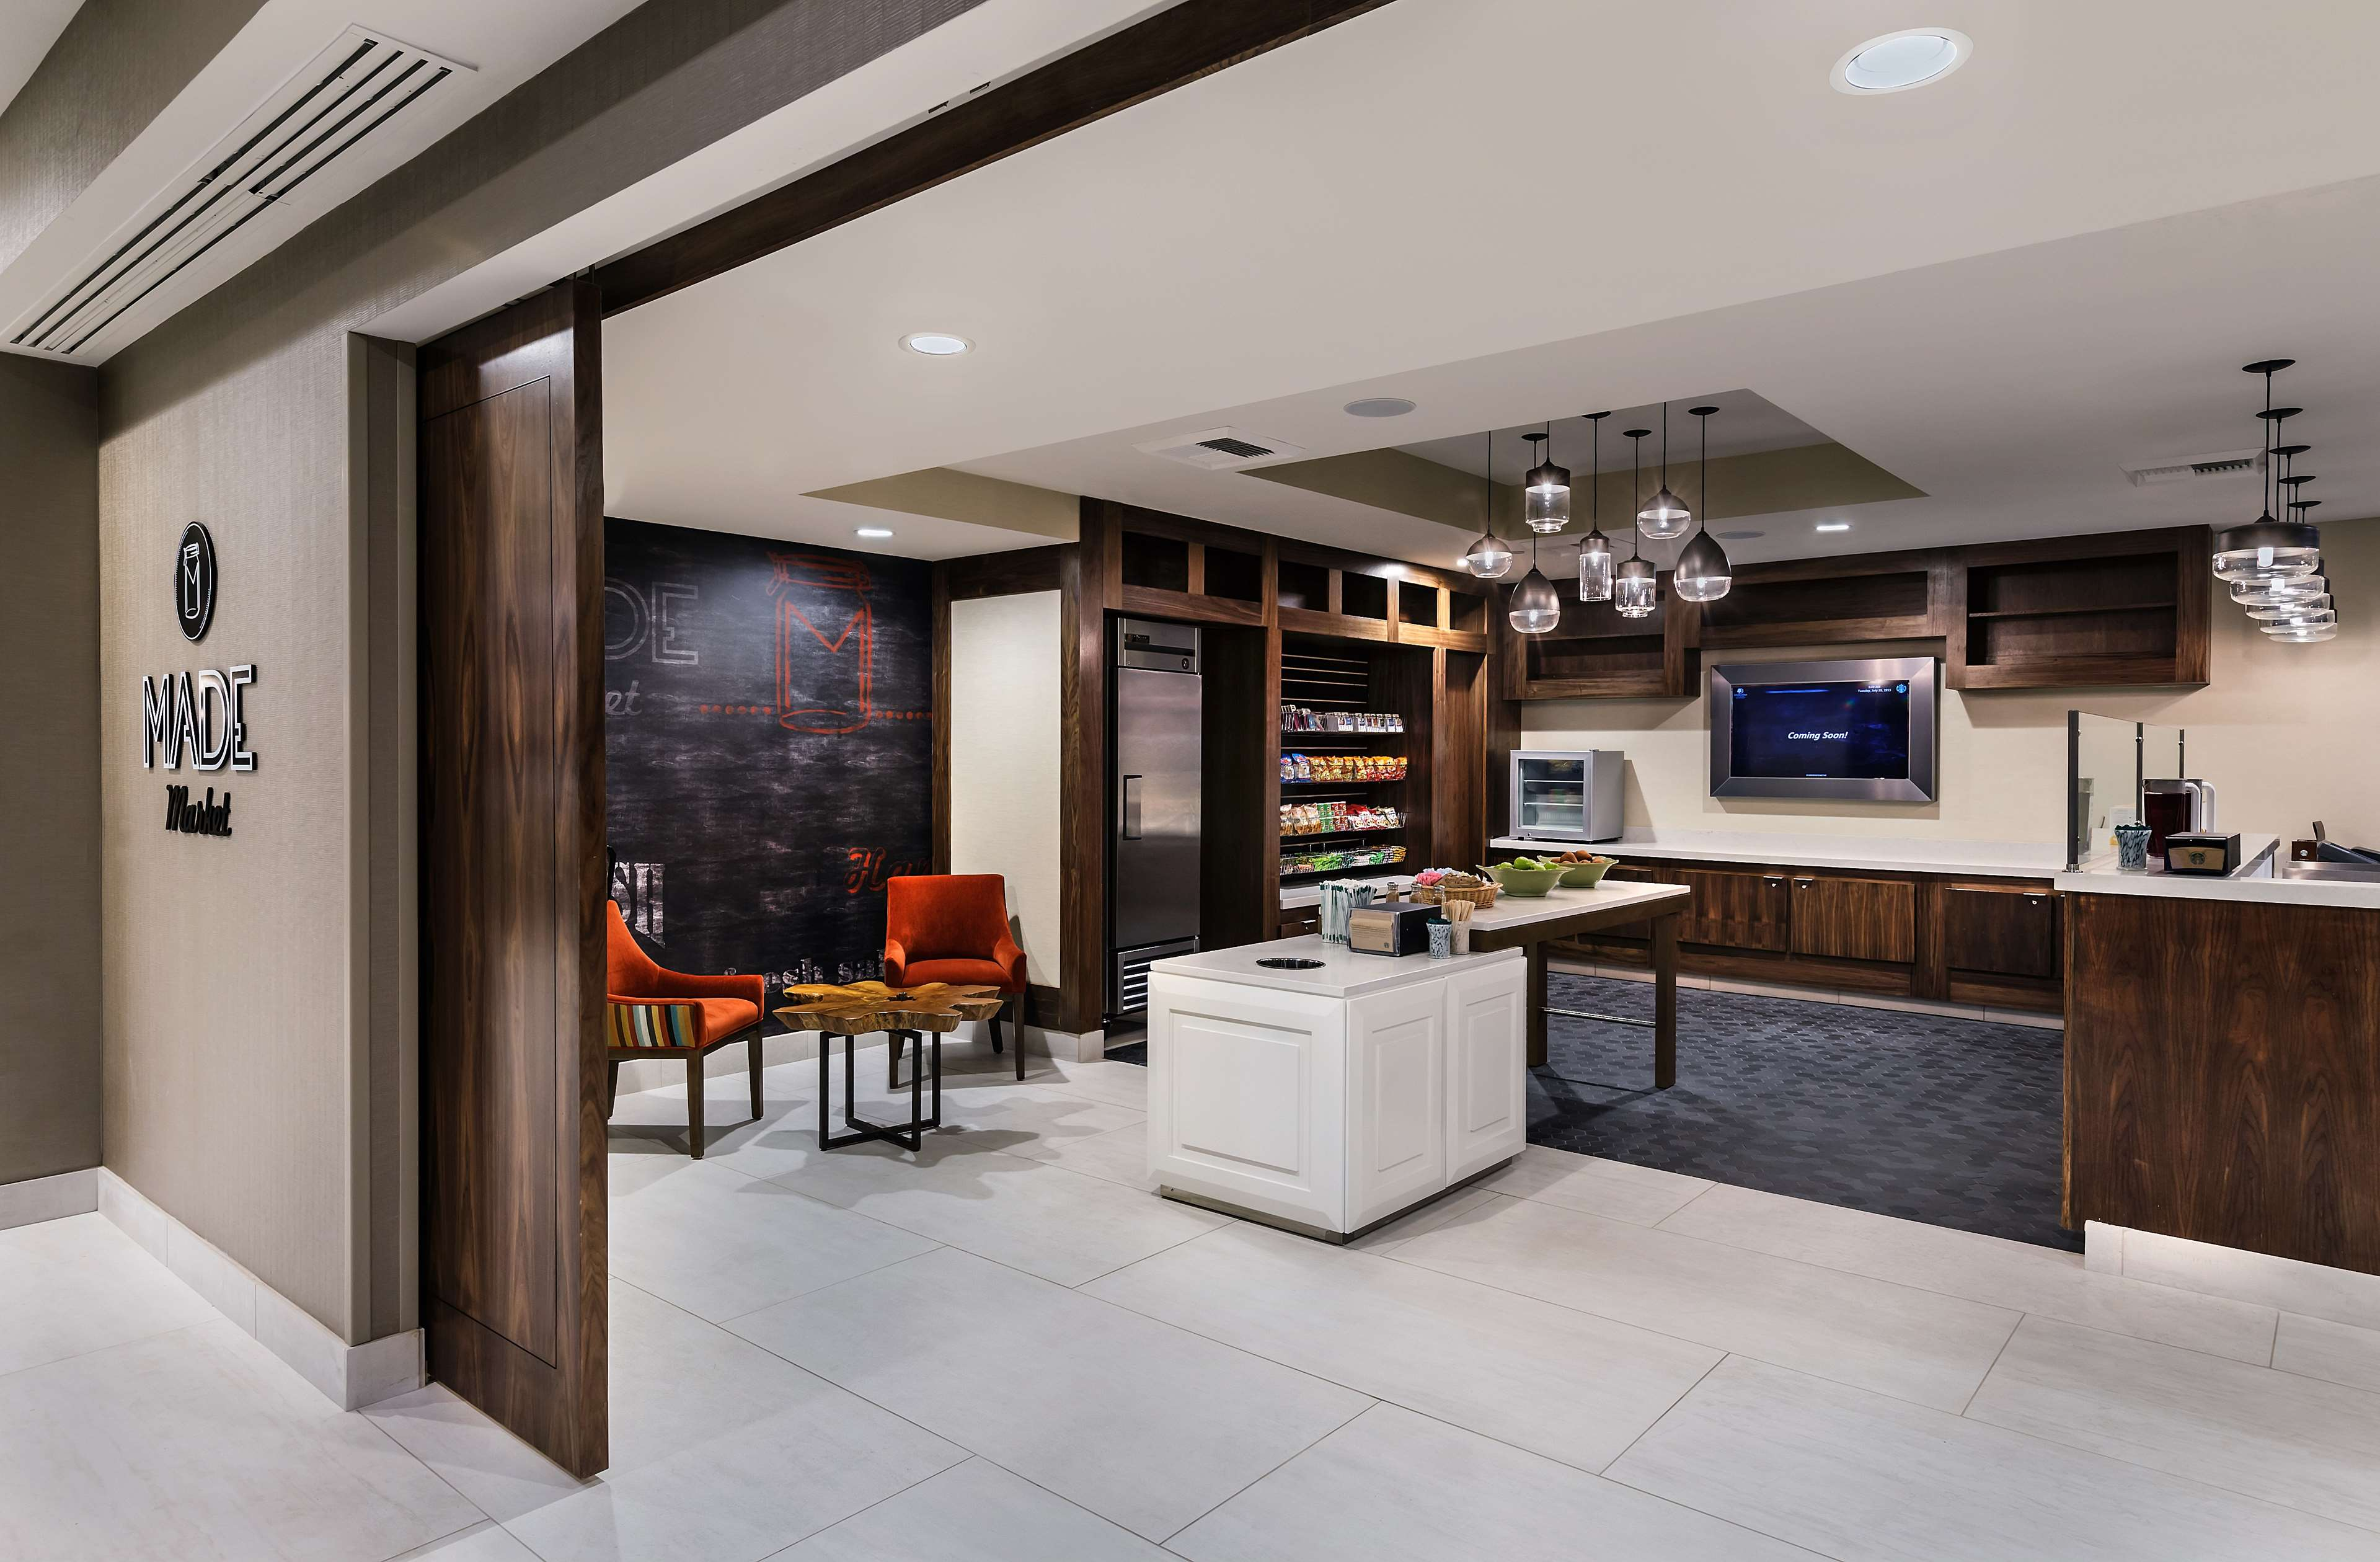 DoubleTree by Hilton Hotel San Bernardino image 9